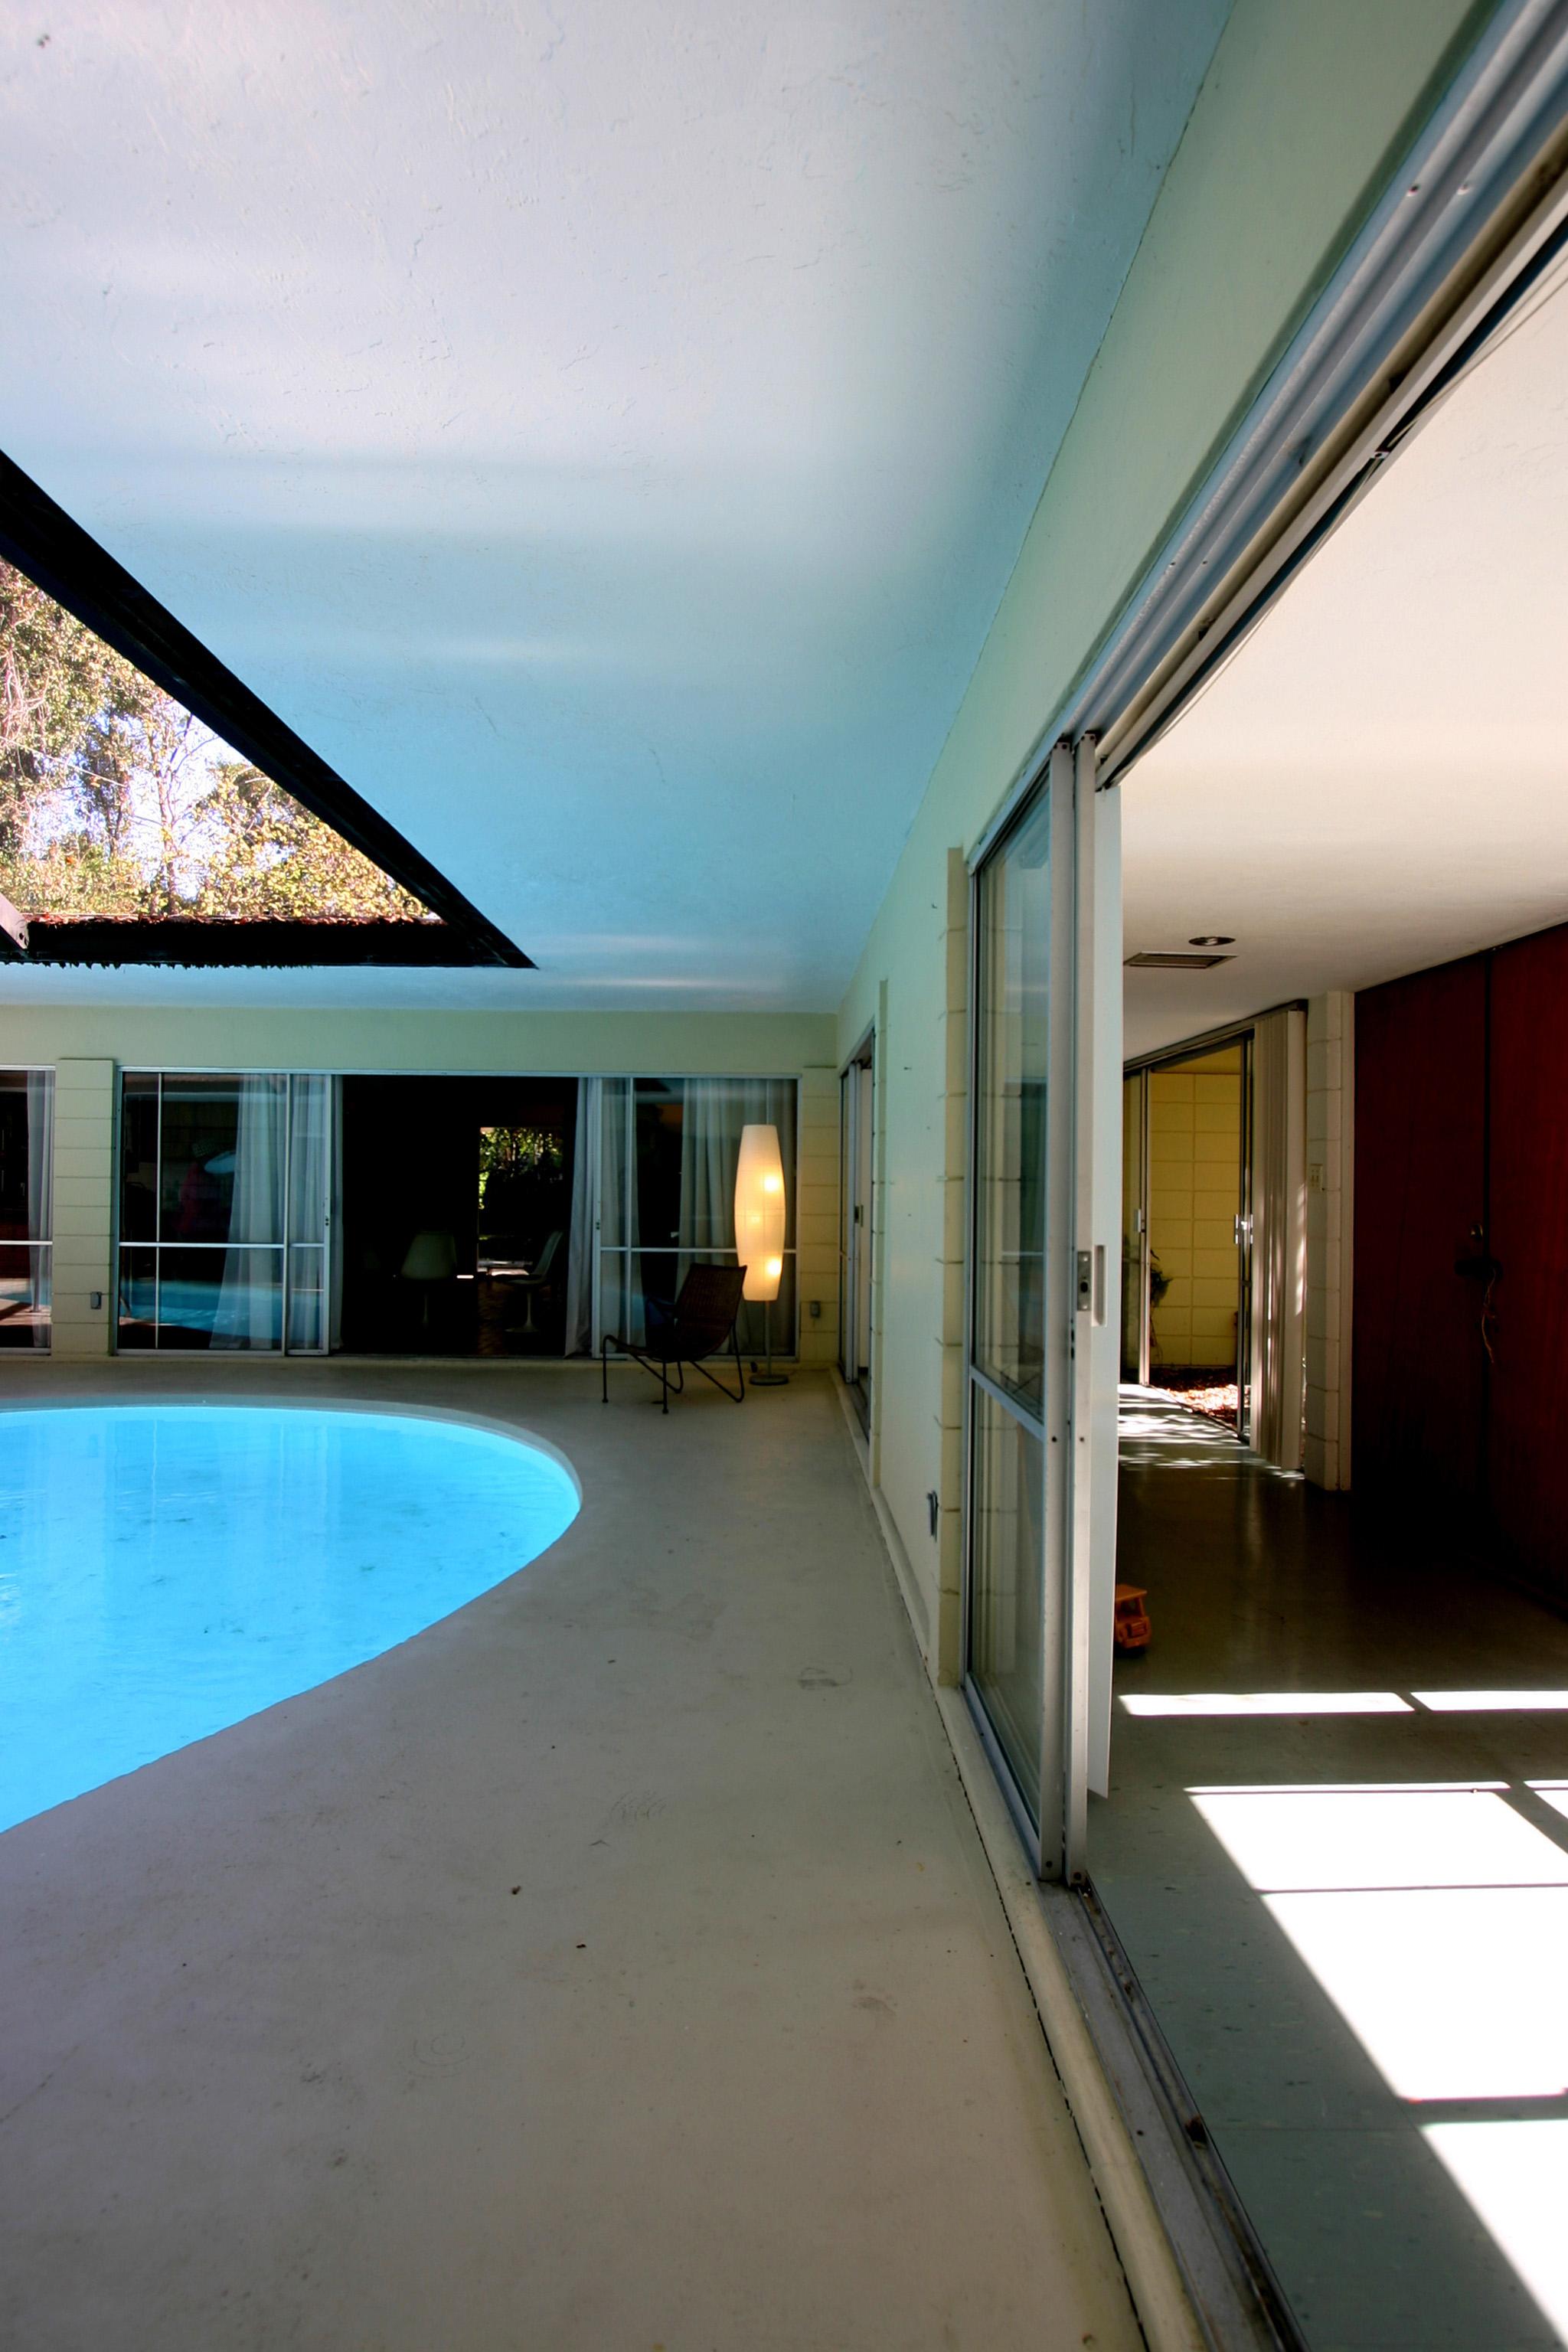 Home addition design program best free home design idea inspiration - Home addition designer ...